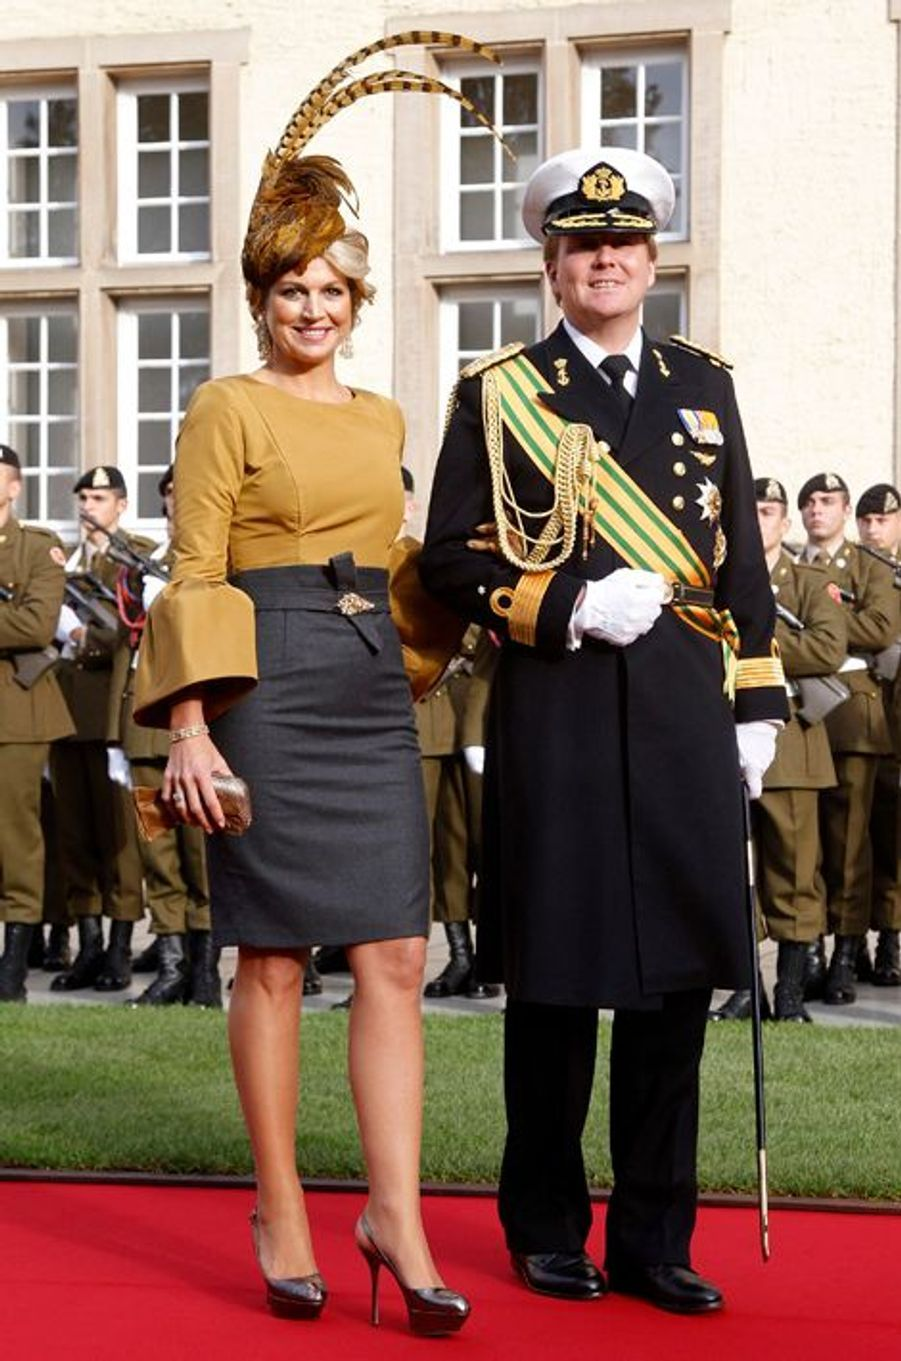 La princesse Maxima des Pays-Bas, le 20 octobre 2012